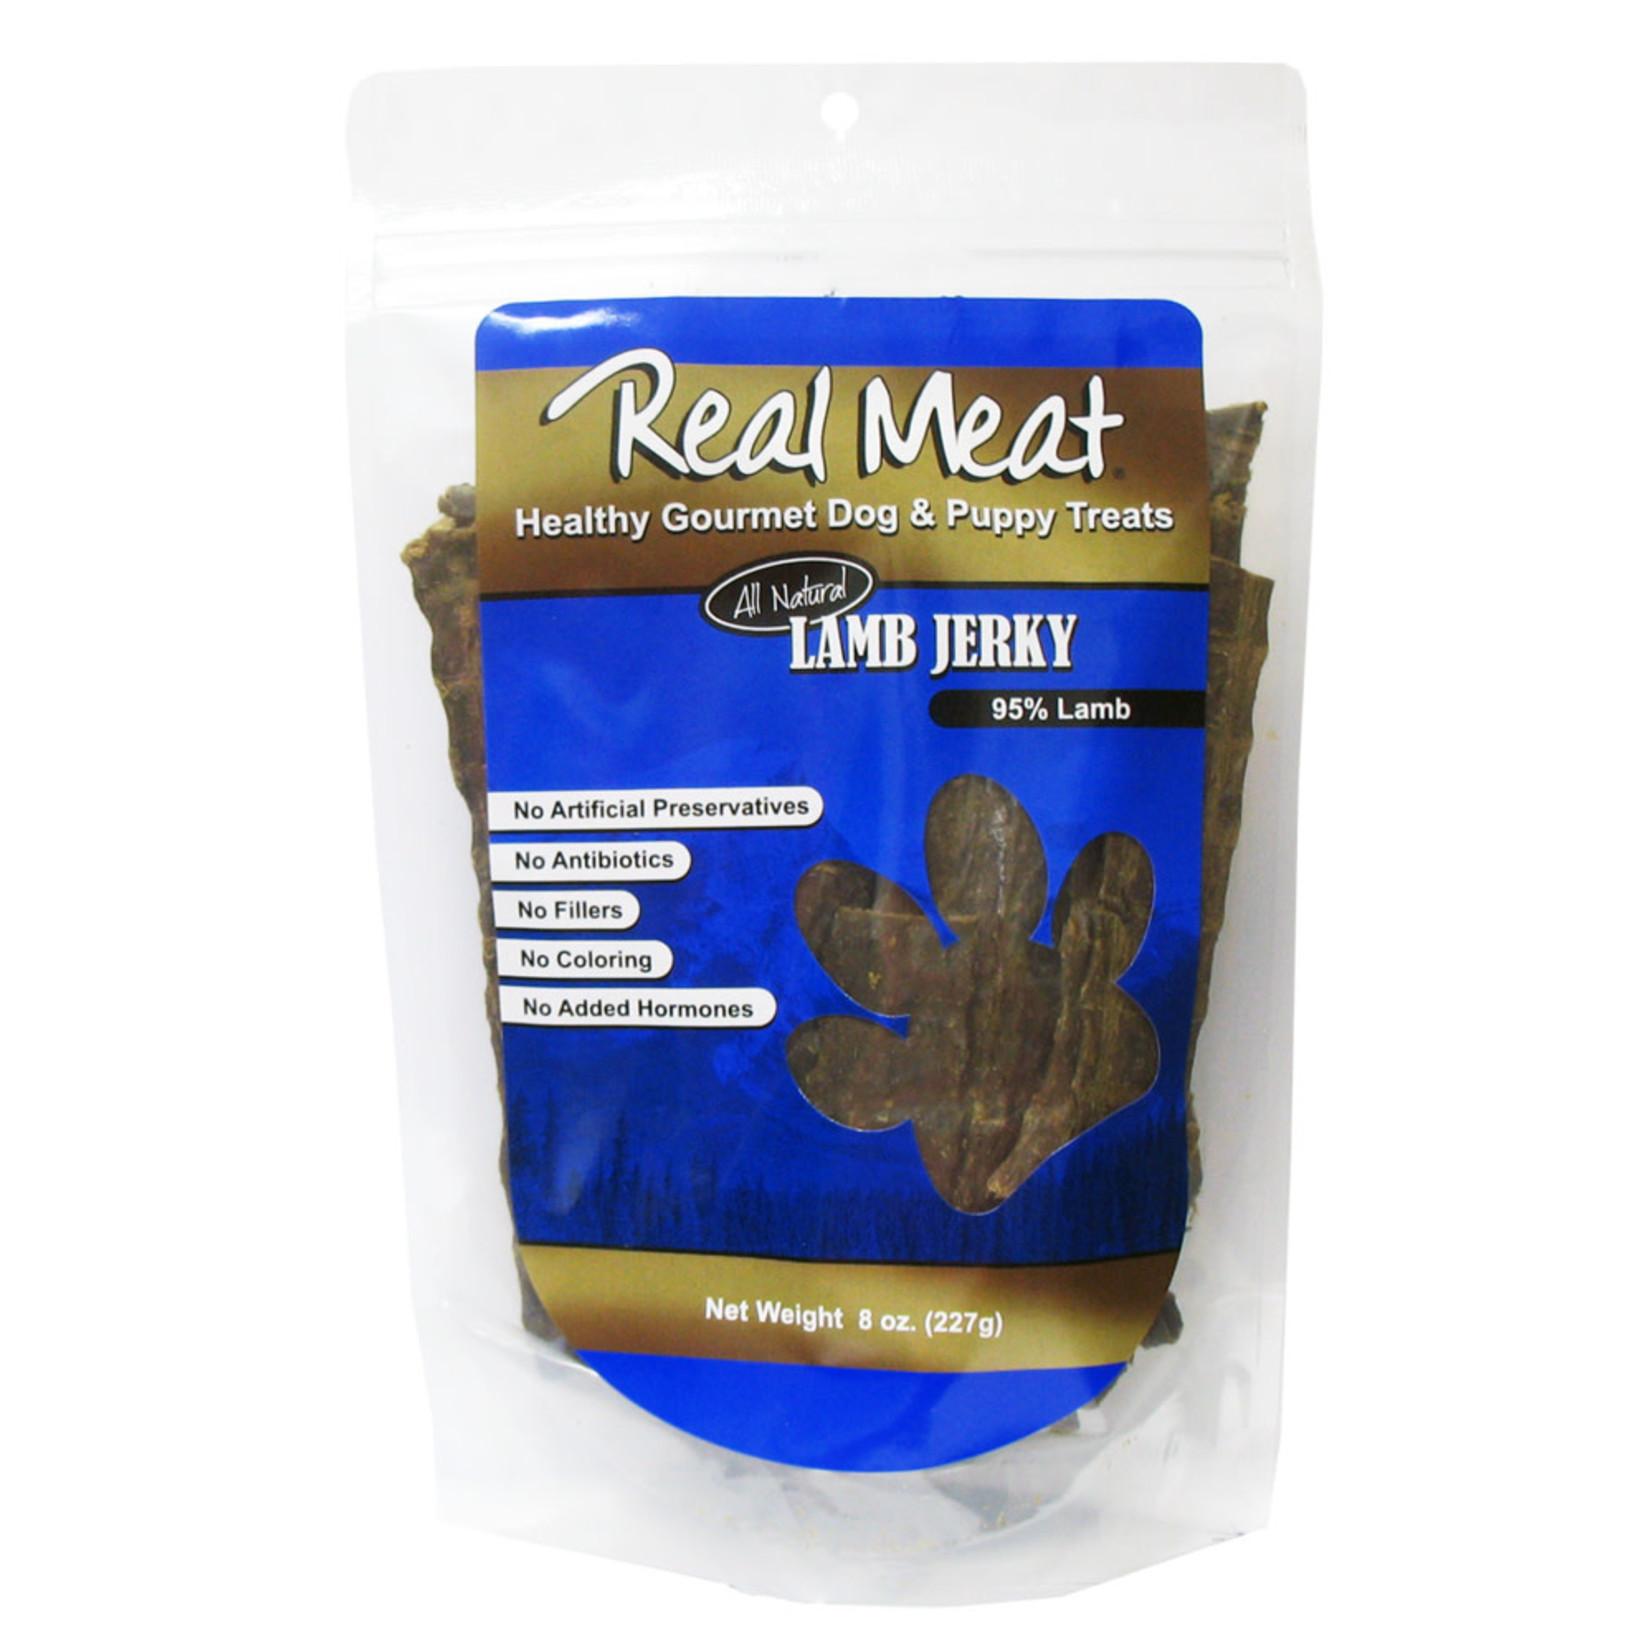 Real Meat Real Meat Lamb Jerky Strips Dog Treats 8oz